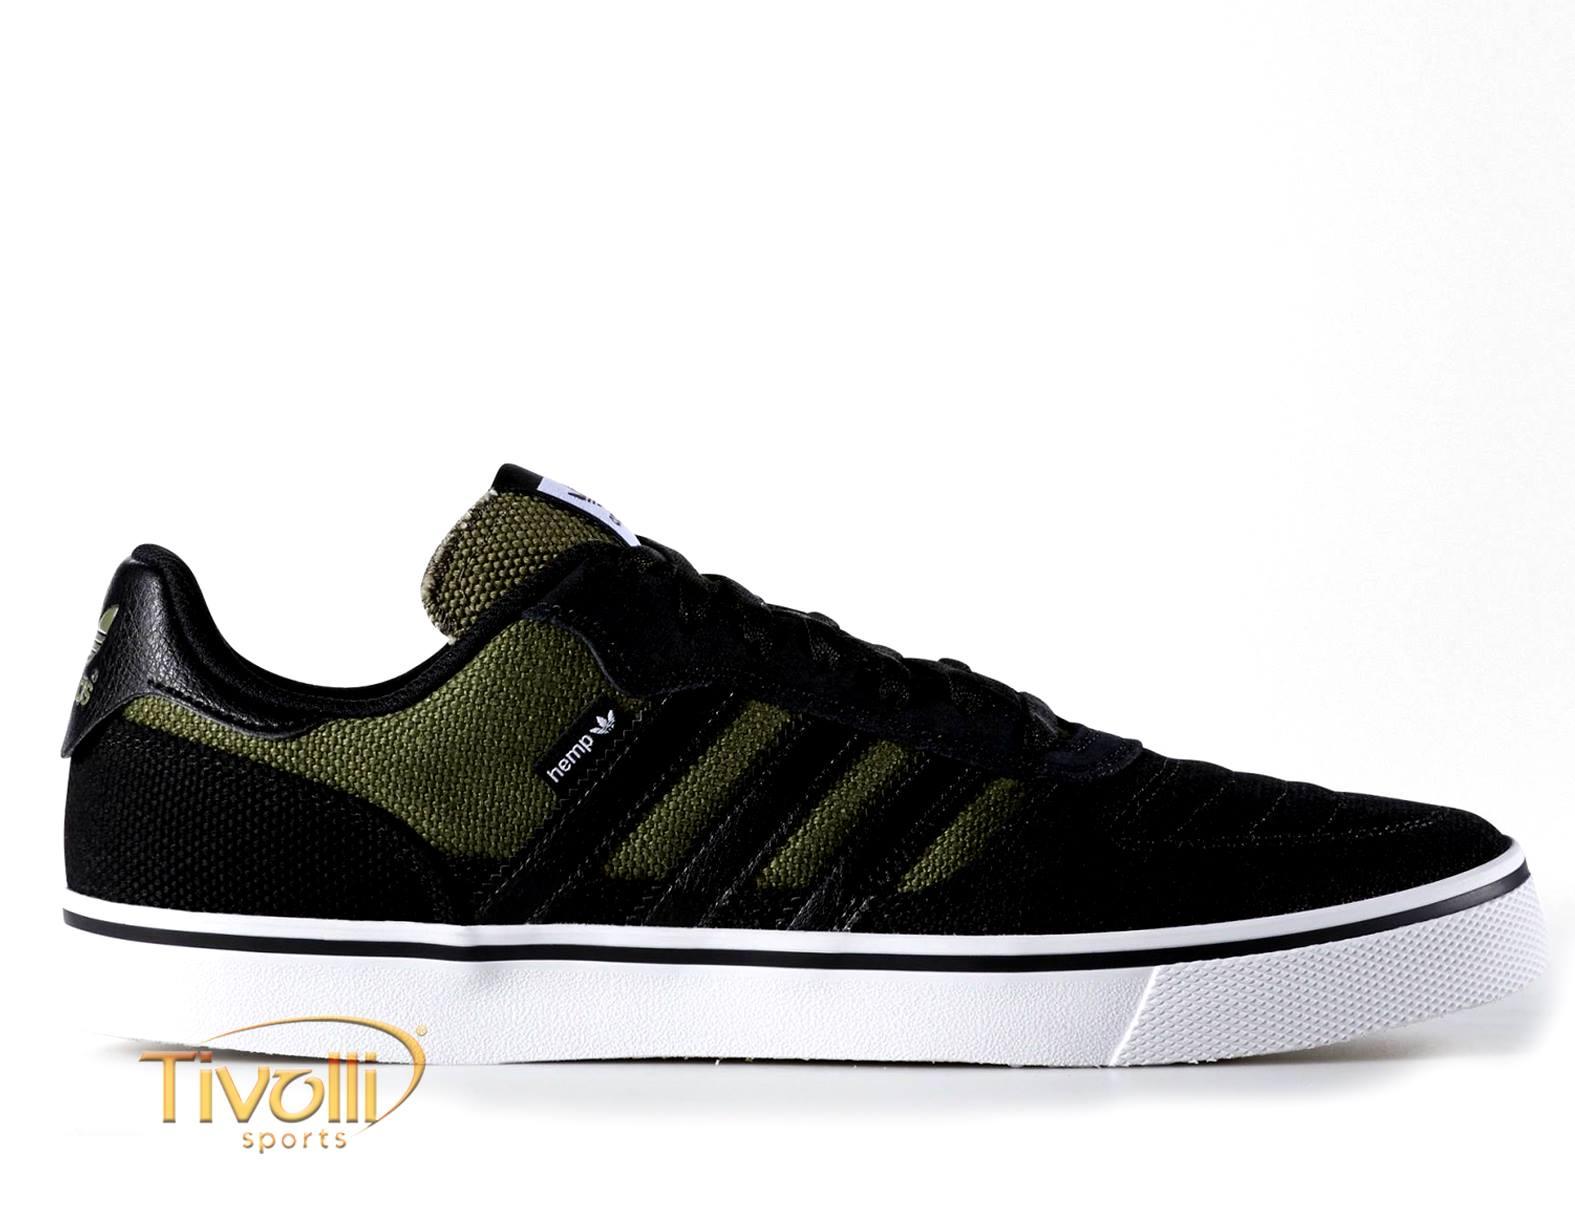 2e7d8a81ae6 Tênis Adidas Copa Vulc Hemp Shoes Masculino   Preto